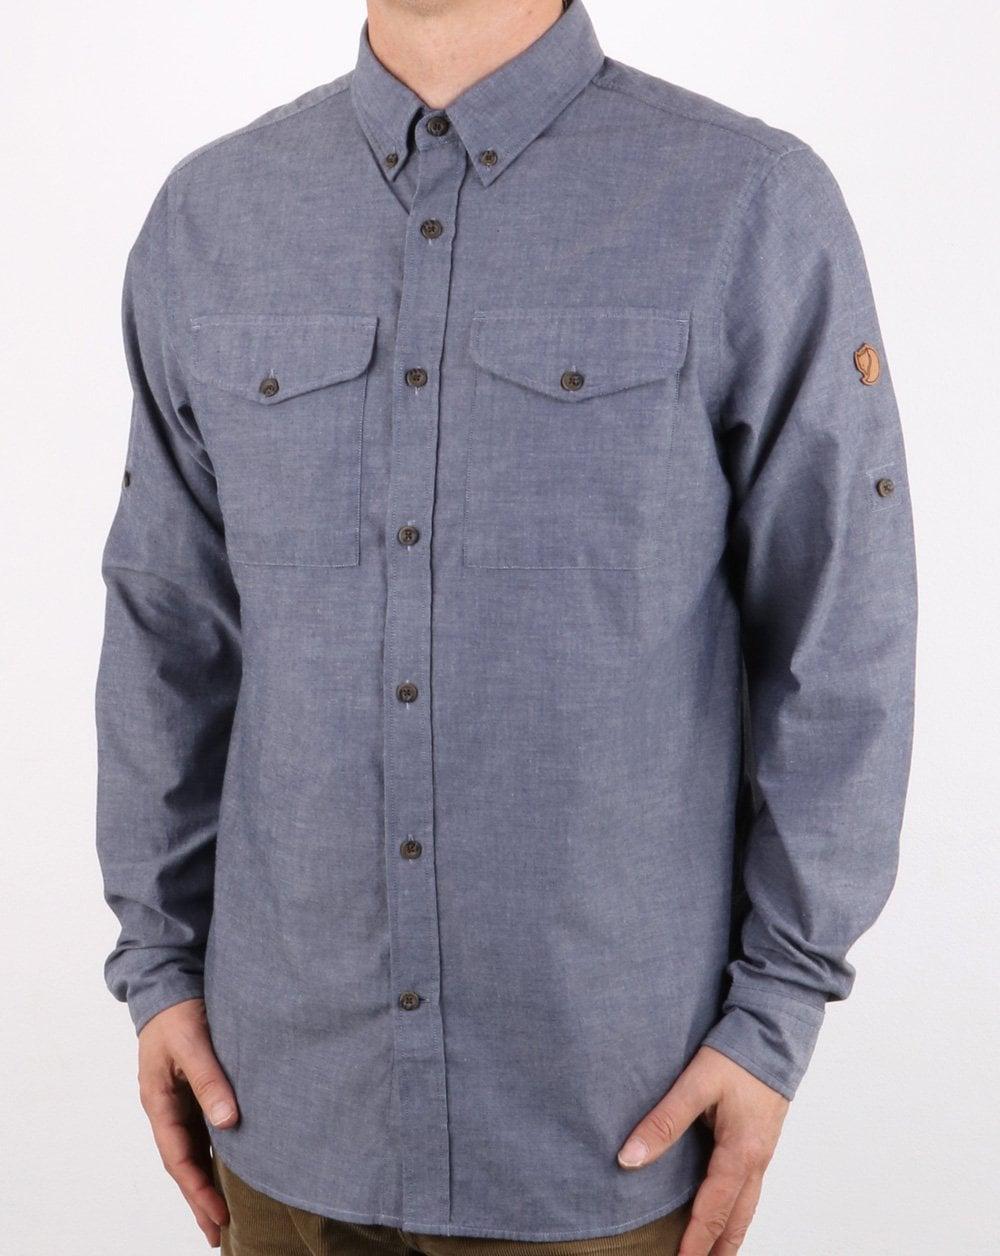 Fjallraven Ovik Chambray Shirt Navy, Mens, Smart, Cotton, Long sleeved 1fc3e1466b